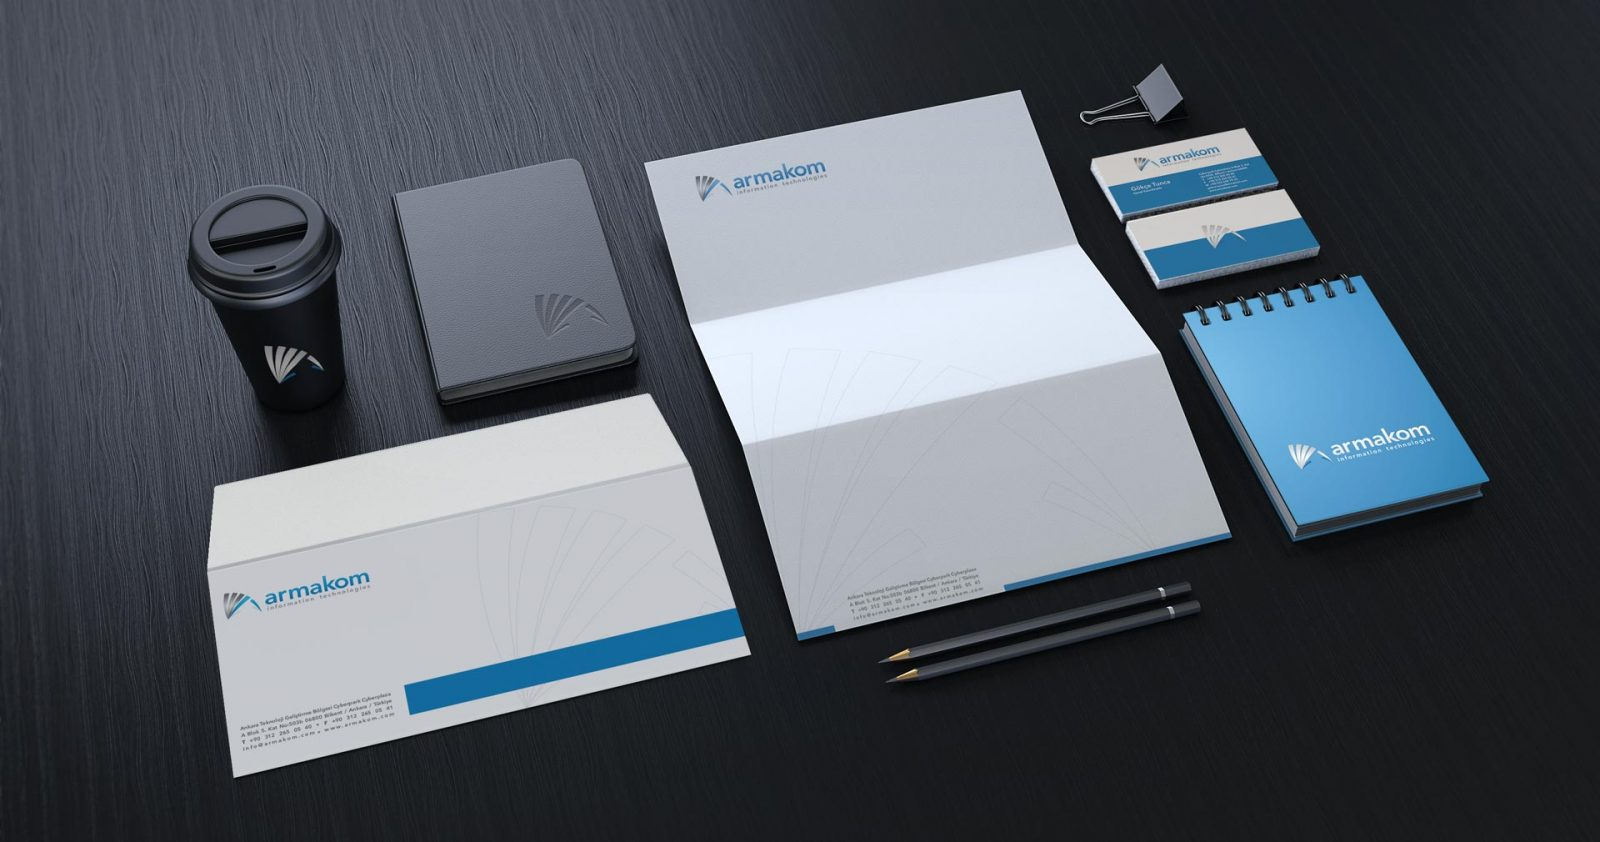 Armakom logo kurumsal kimlik tasarımı 05